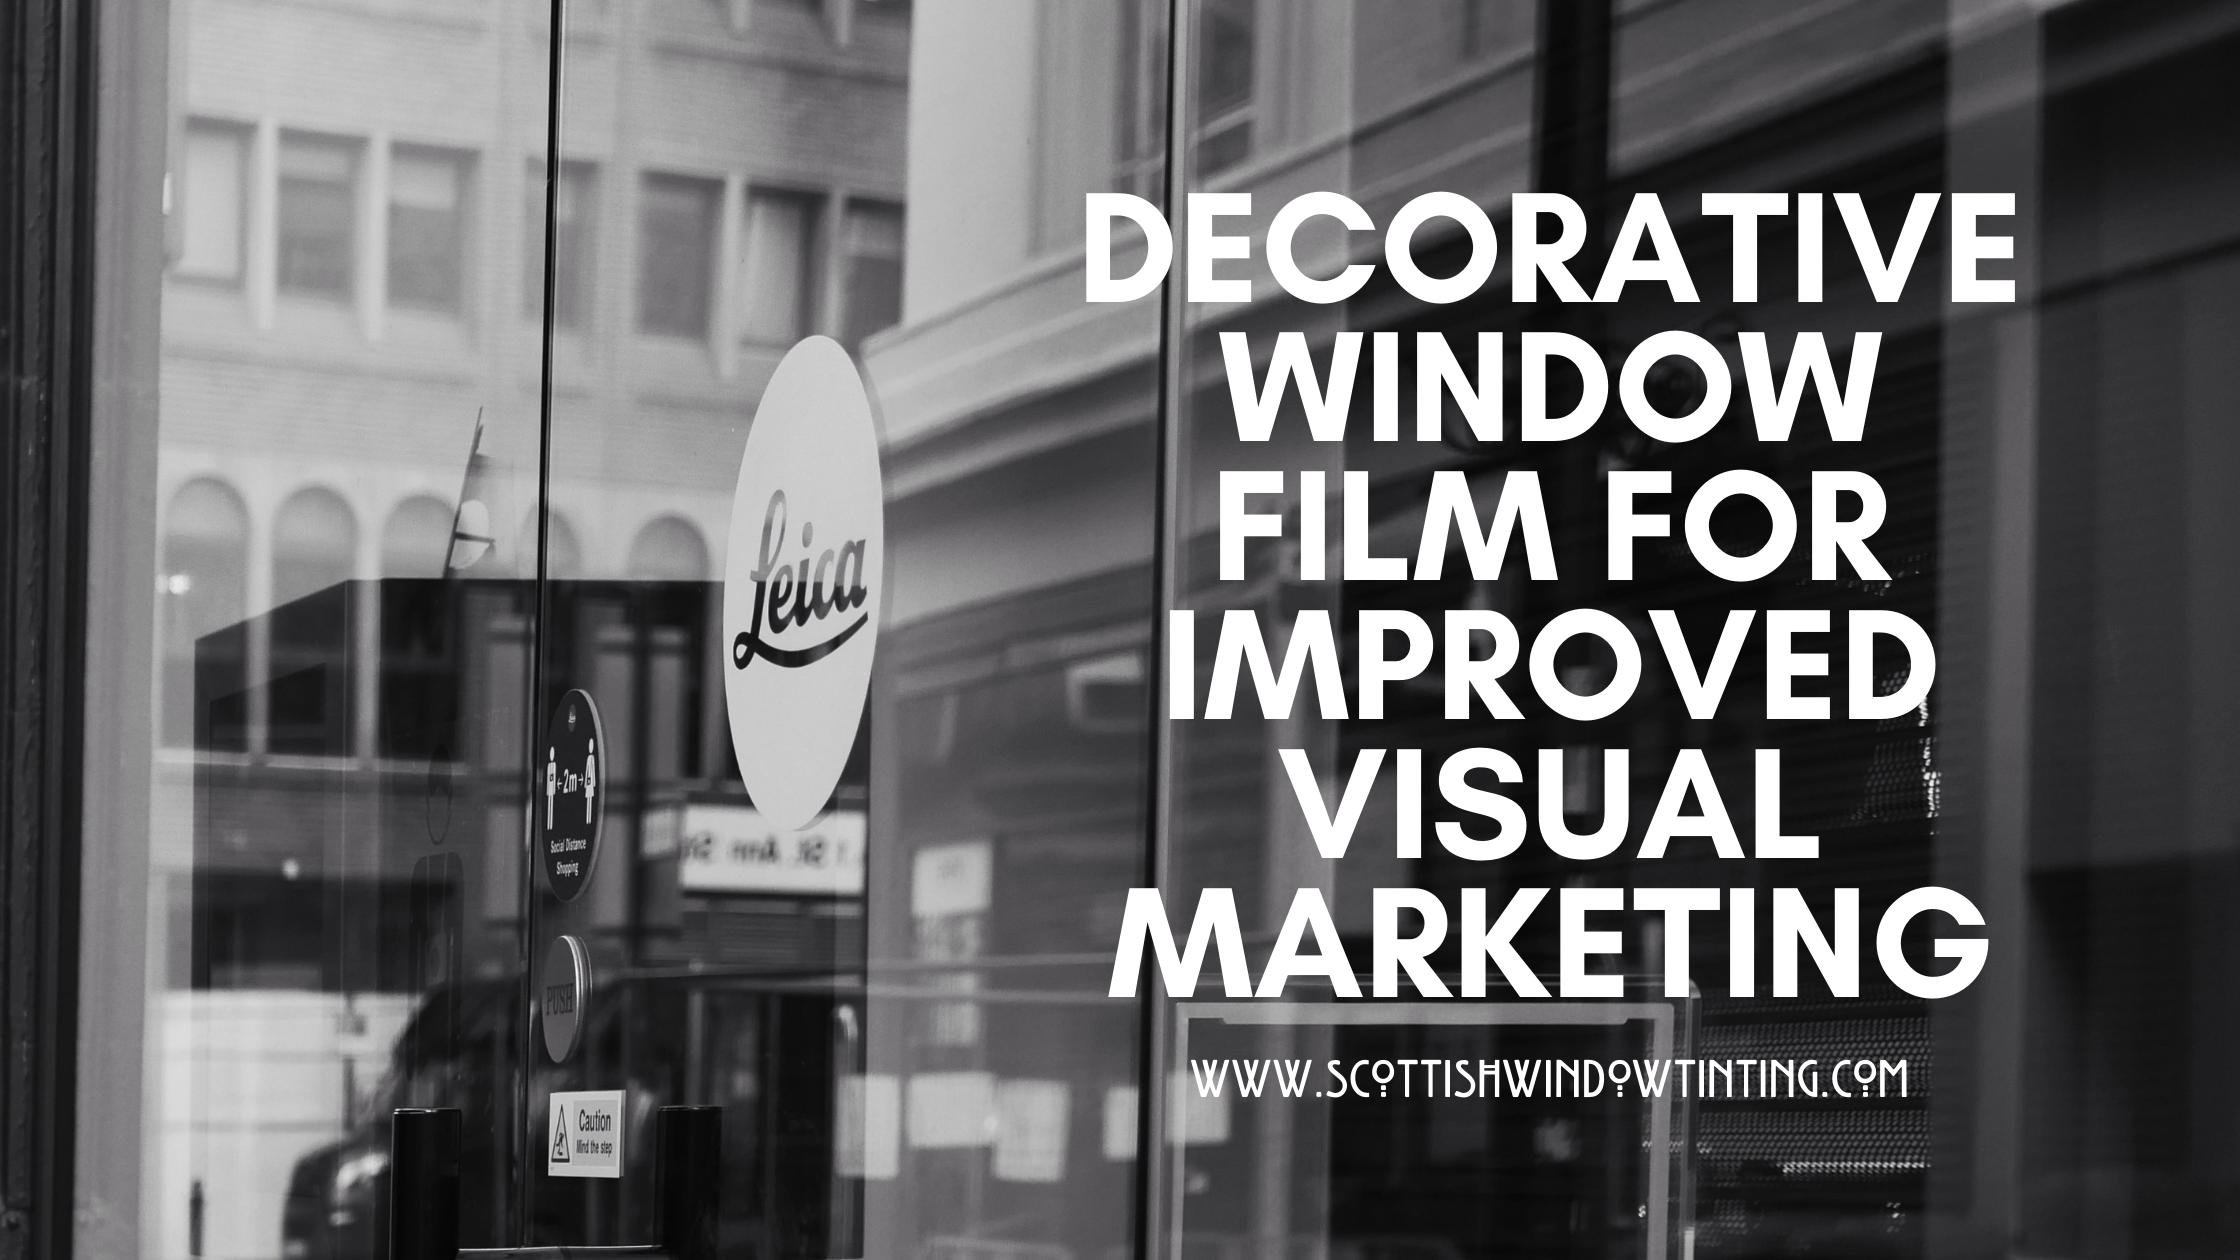 3 Ways to Improve Your Kansas City Business' Visual Marketing With Decorative Window Film